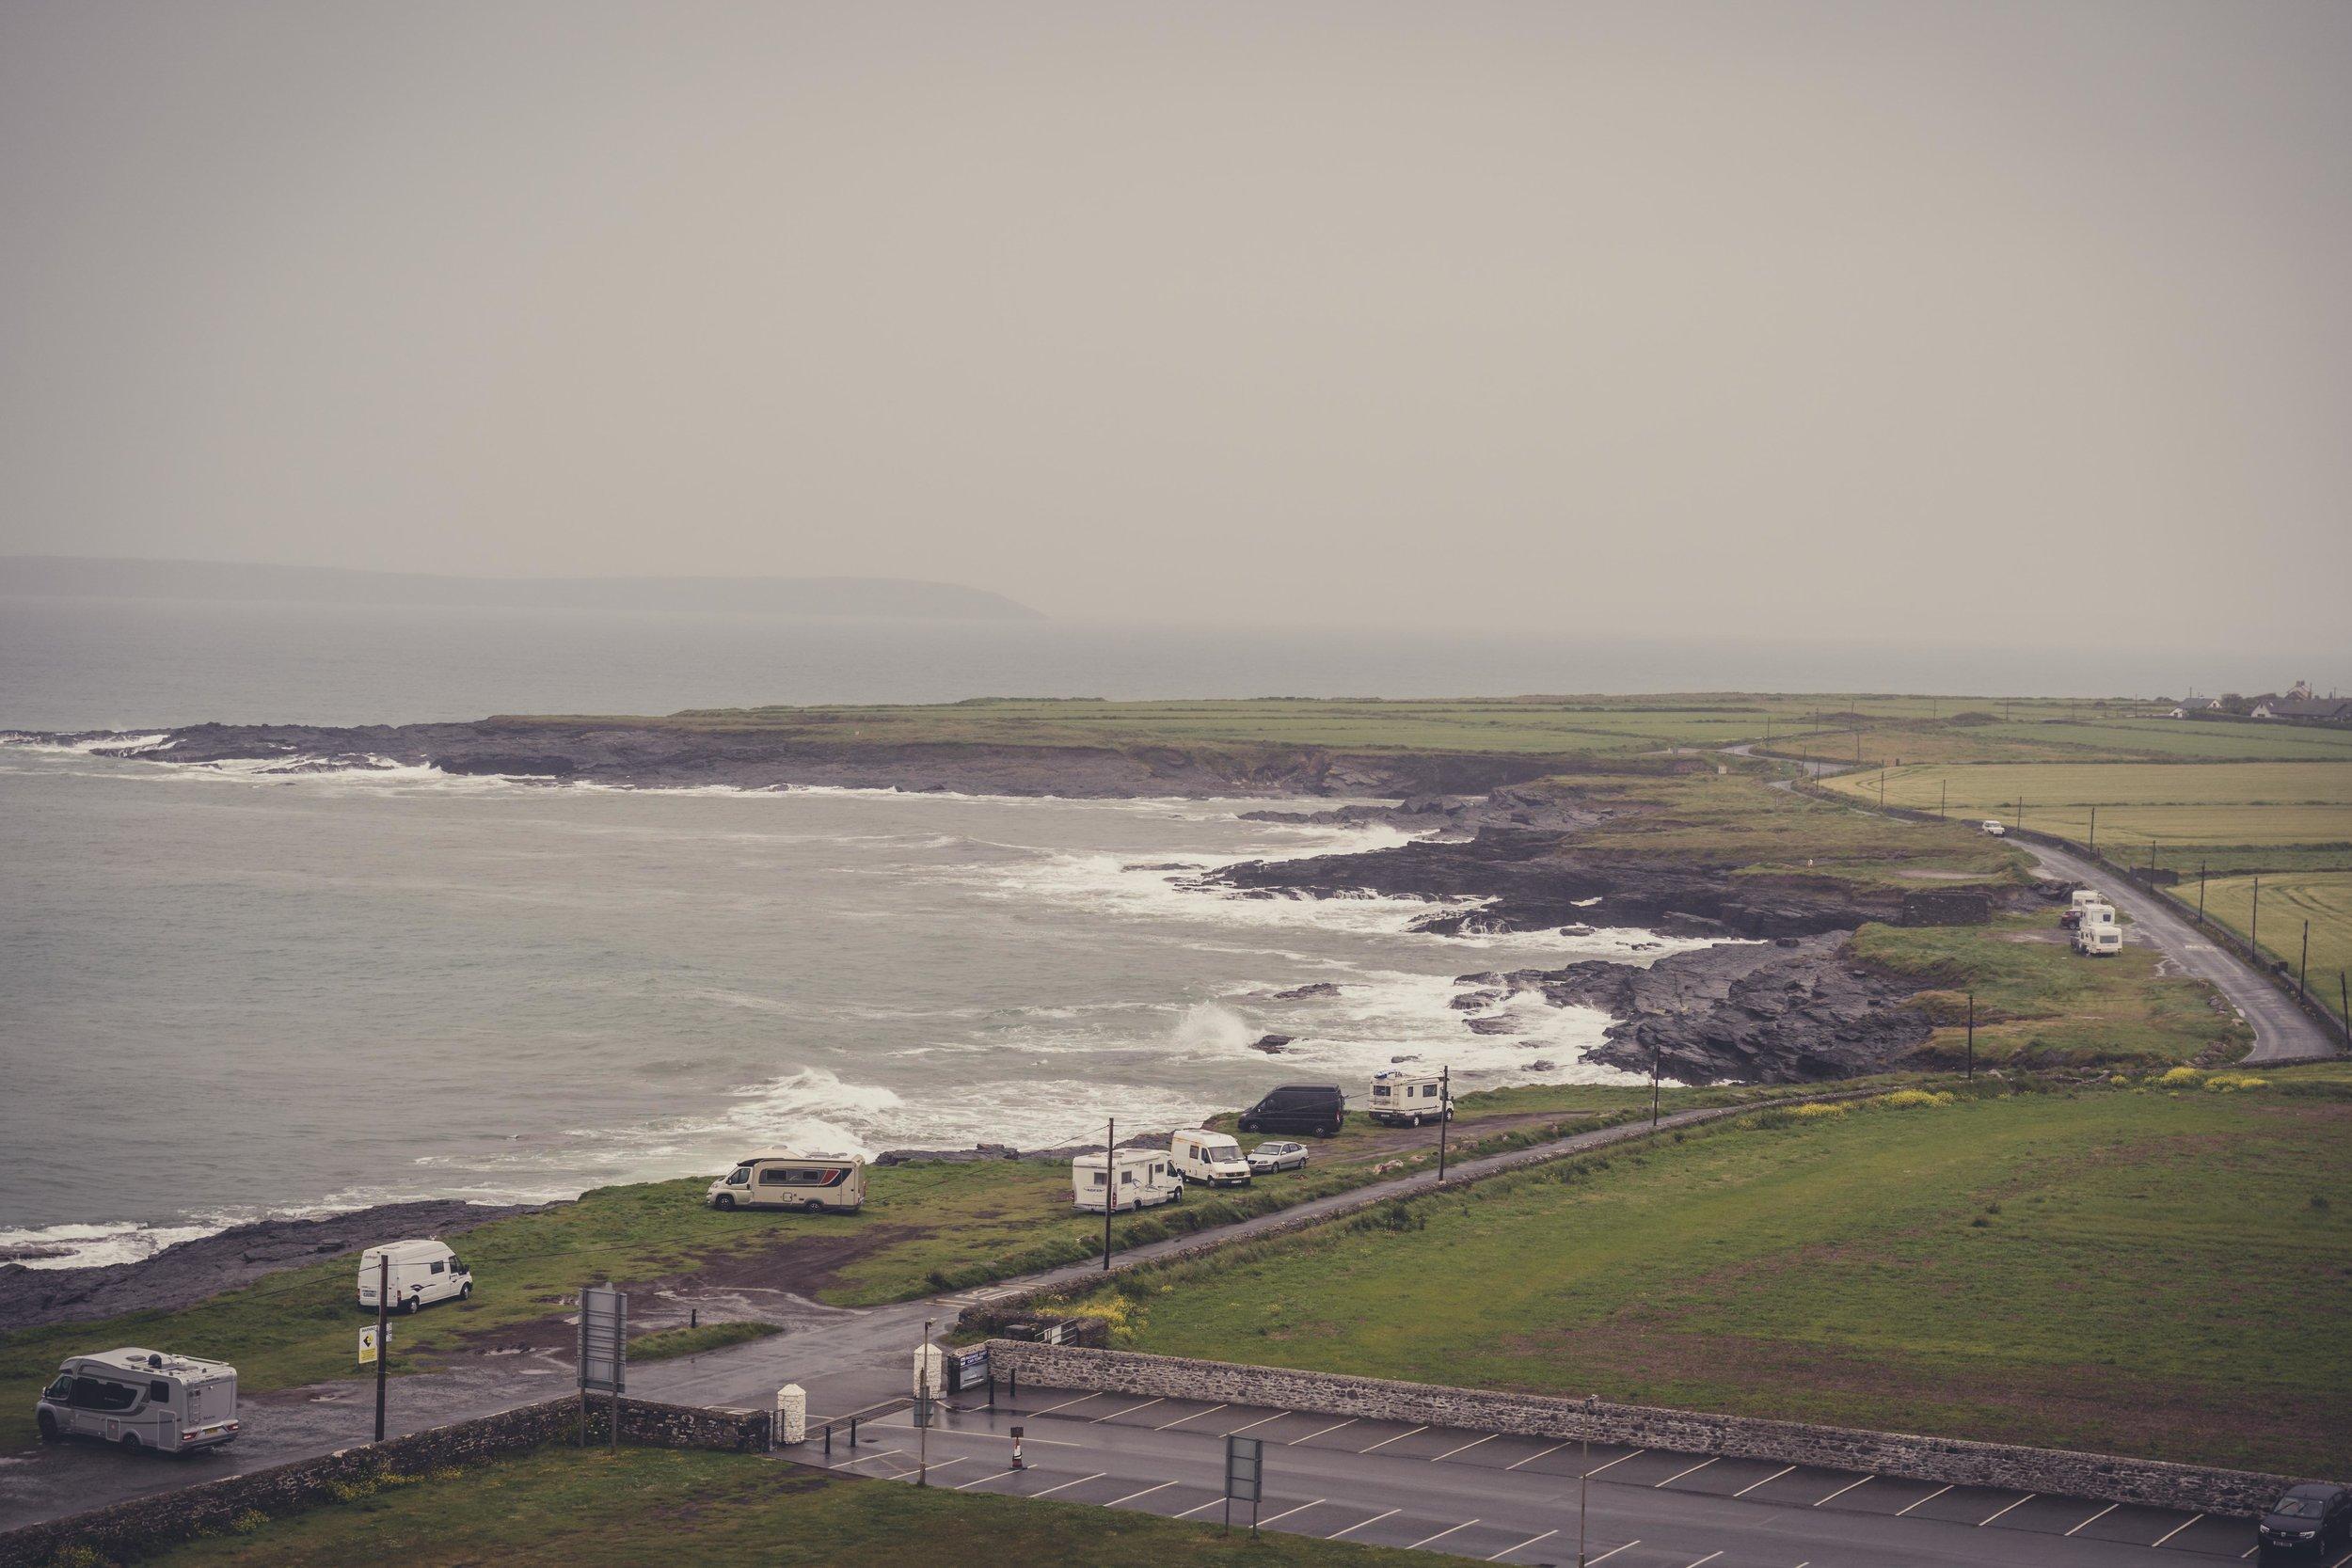 Hookhead Lighthouse wexford ireland stormy landscape.jpg